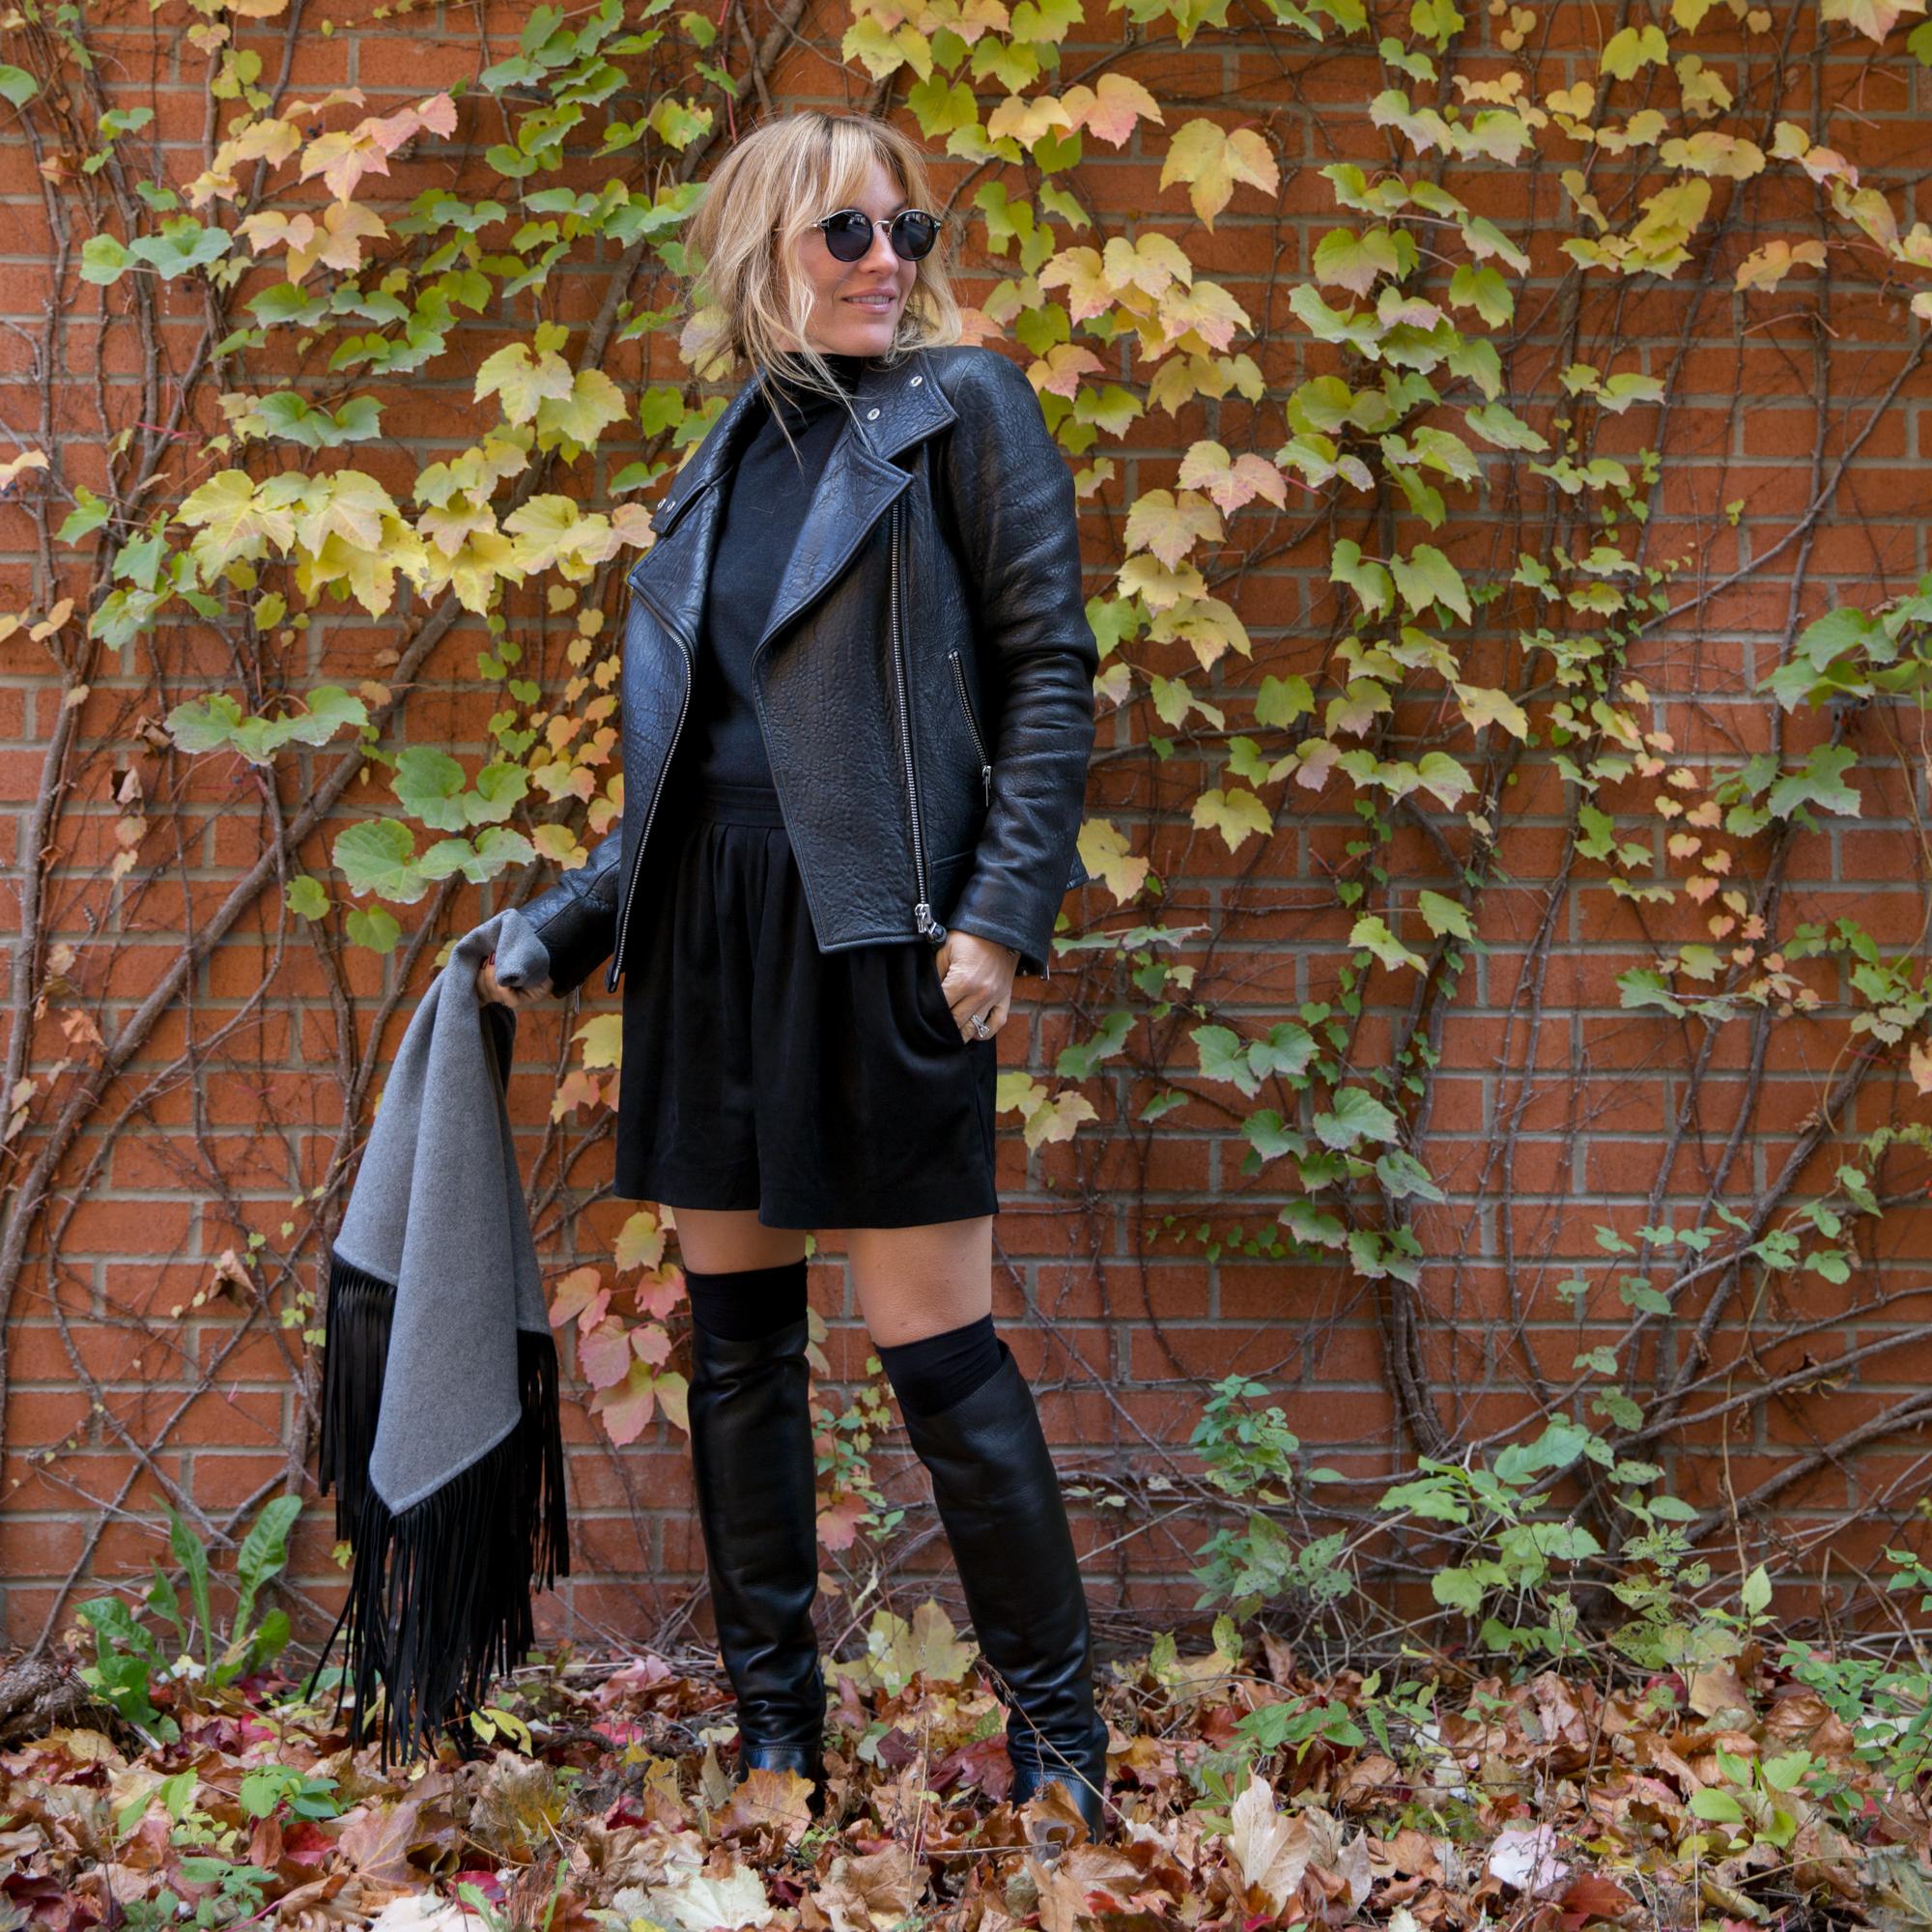 mackage leather jacket and shawl on mademoiselle jules fashion blogger